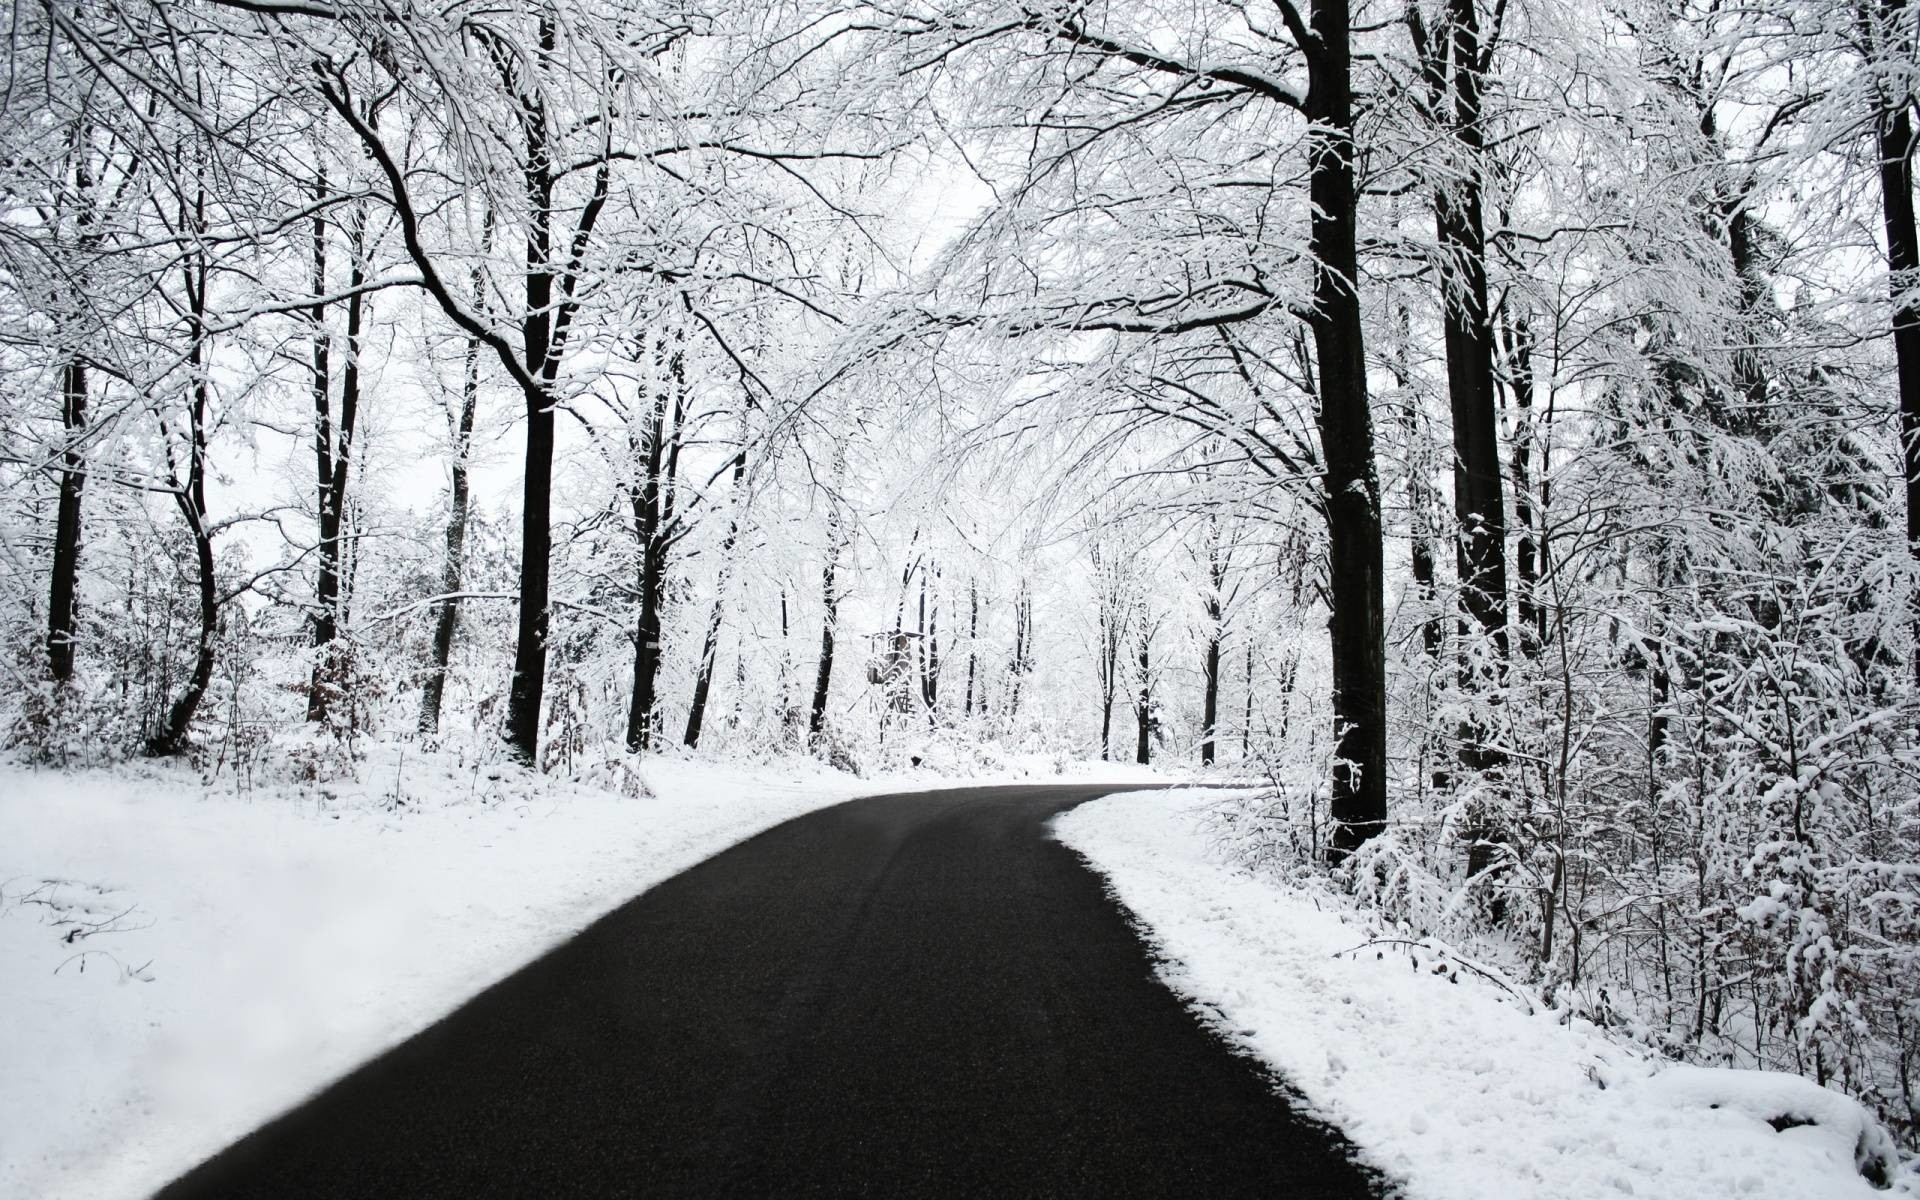 Winter Screensavers 16 Backgrounds | Wallruru.